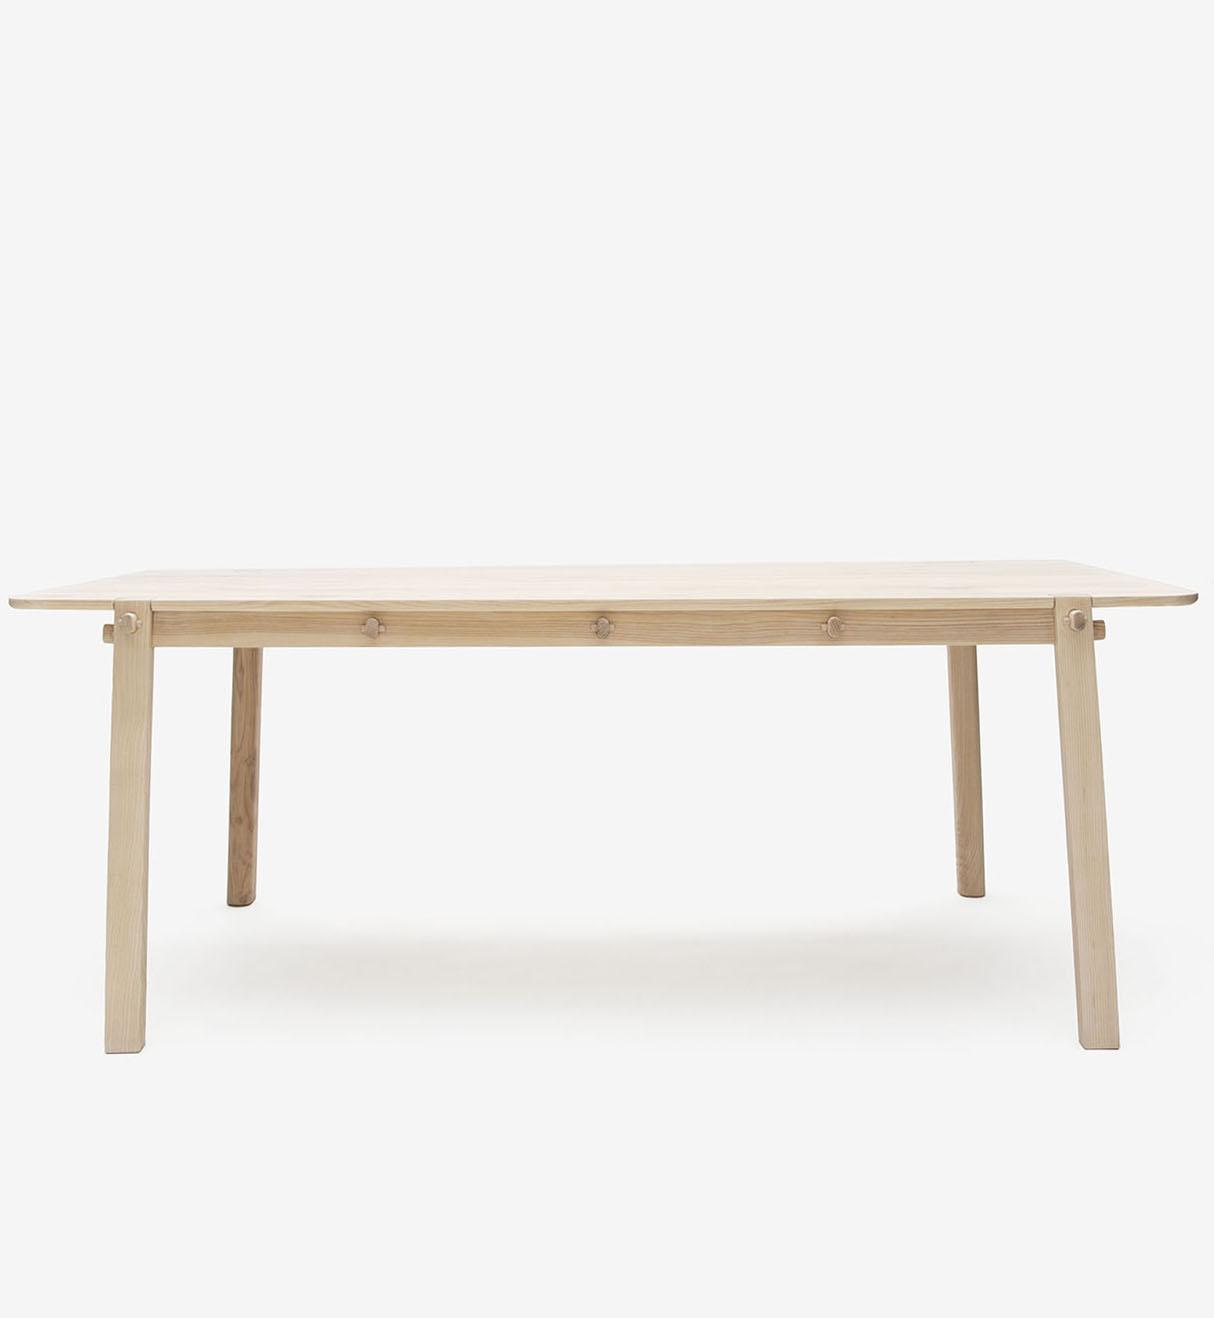 furn_table_side_bøøt1